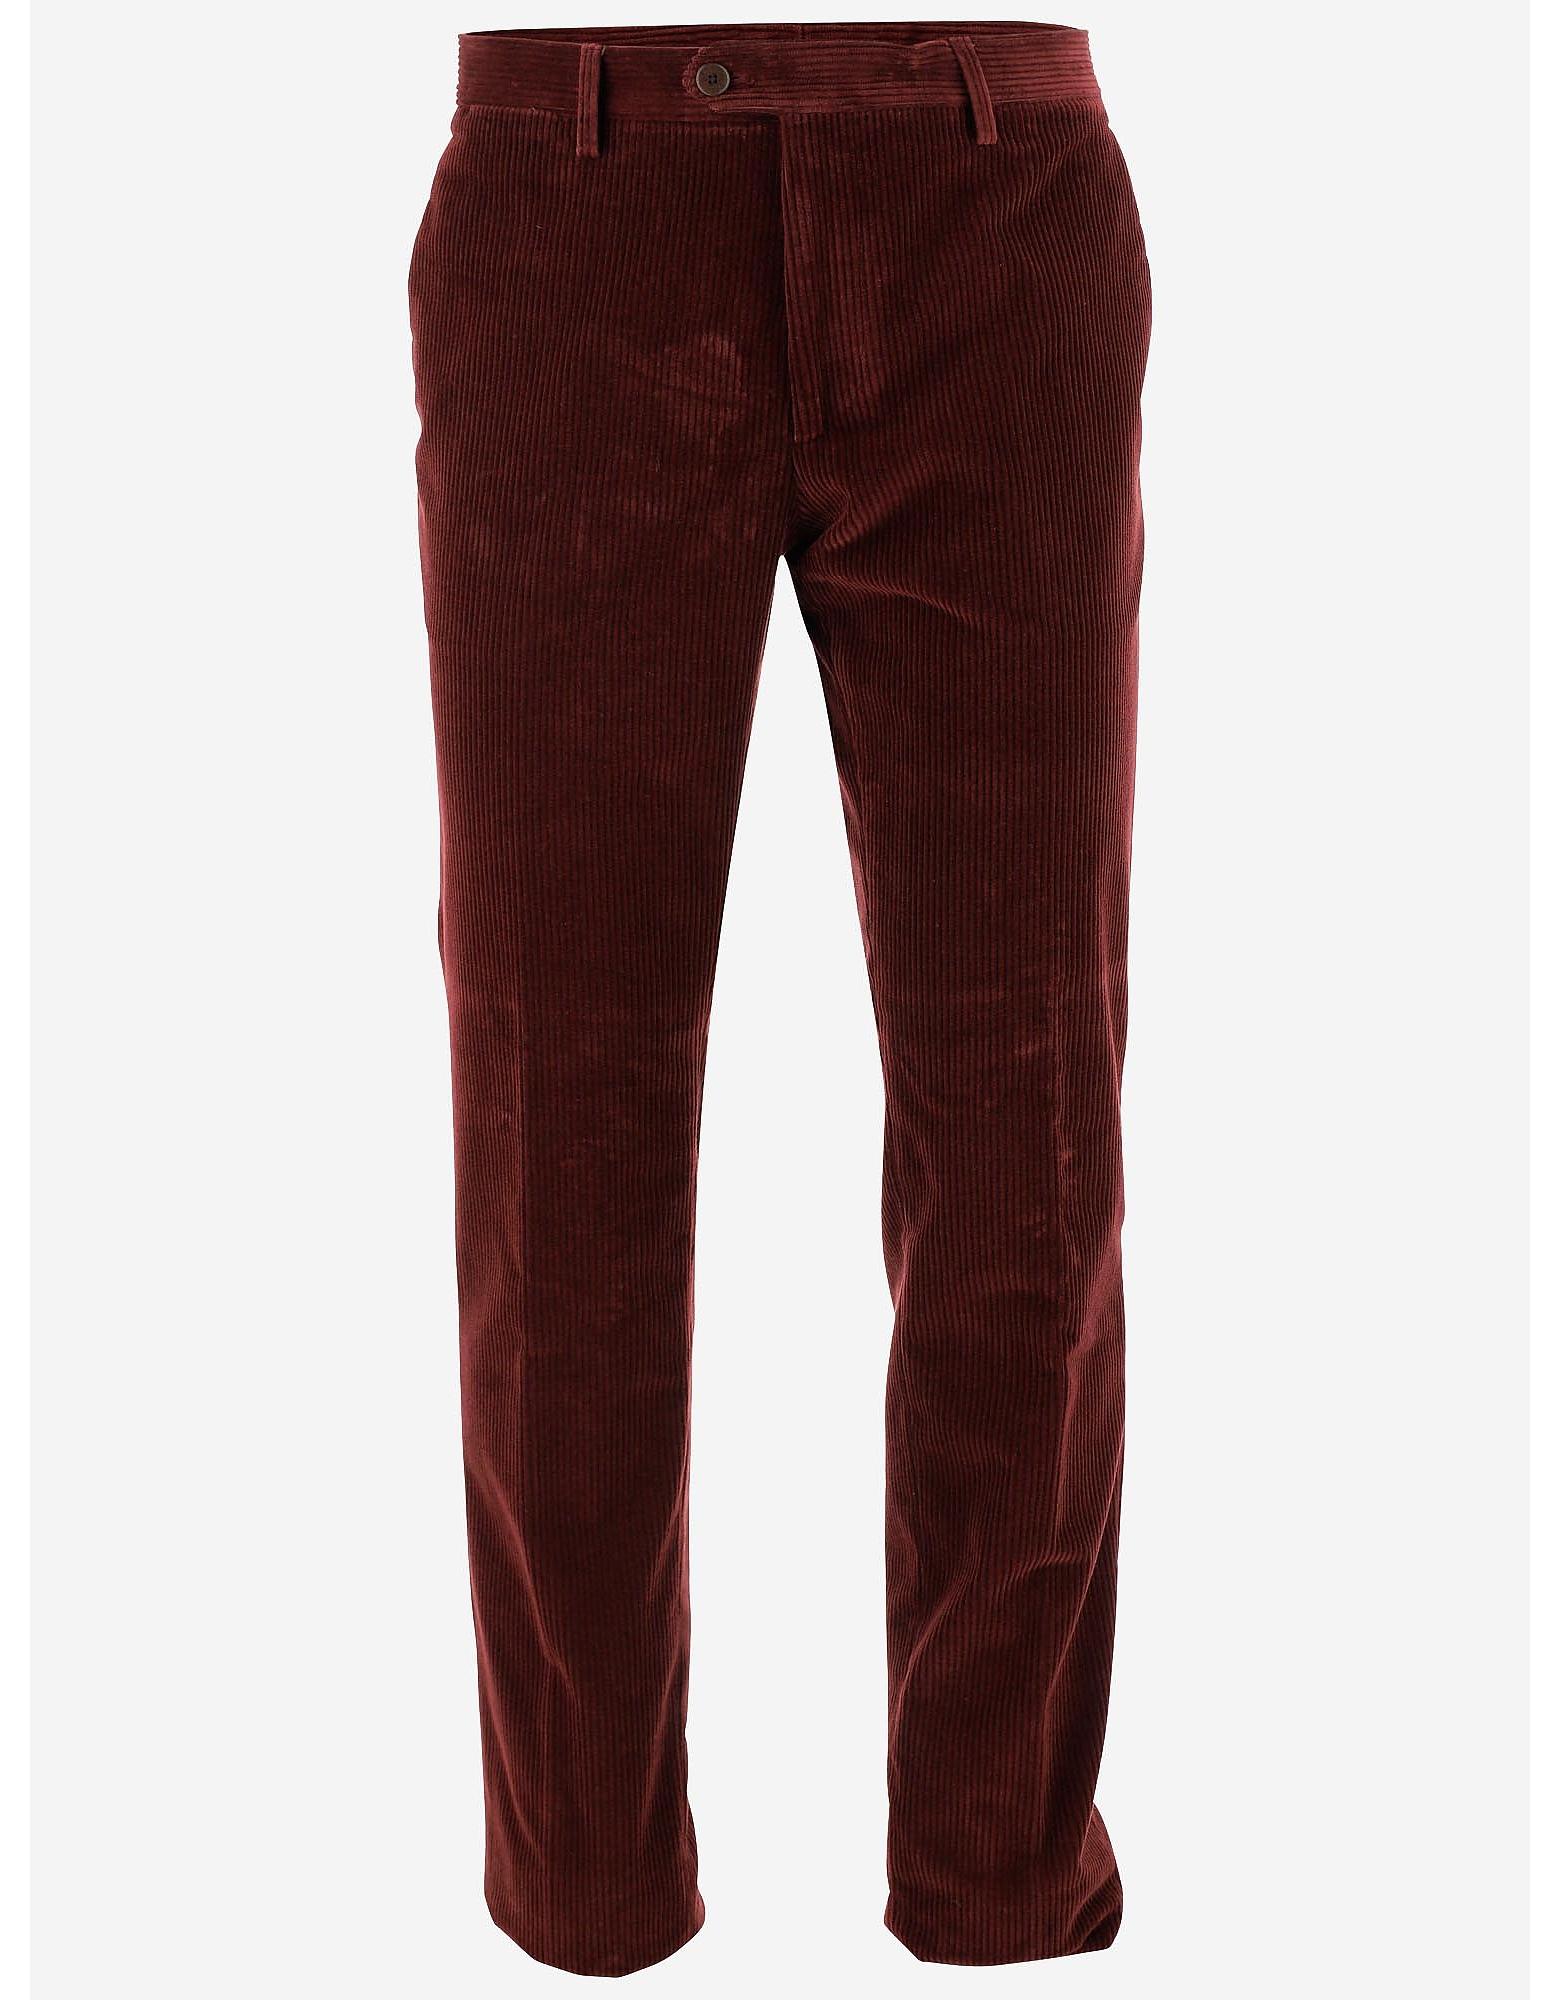 Etro Designer Pants, Men's Straight Pants